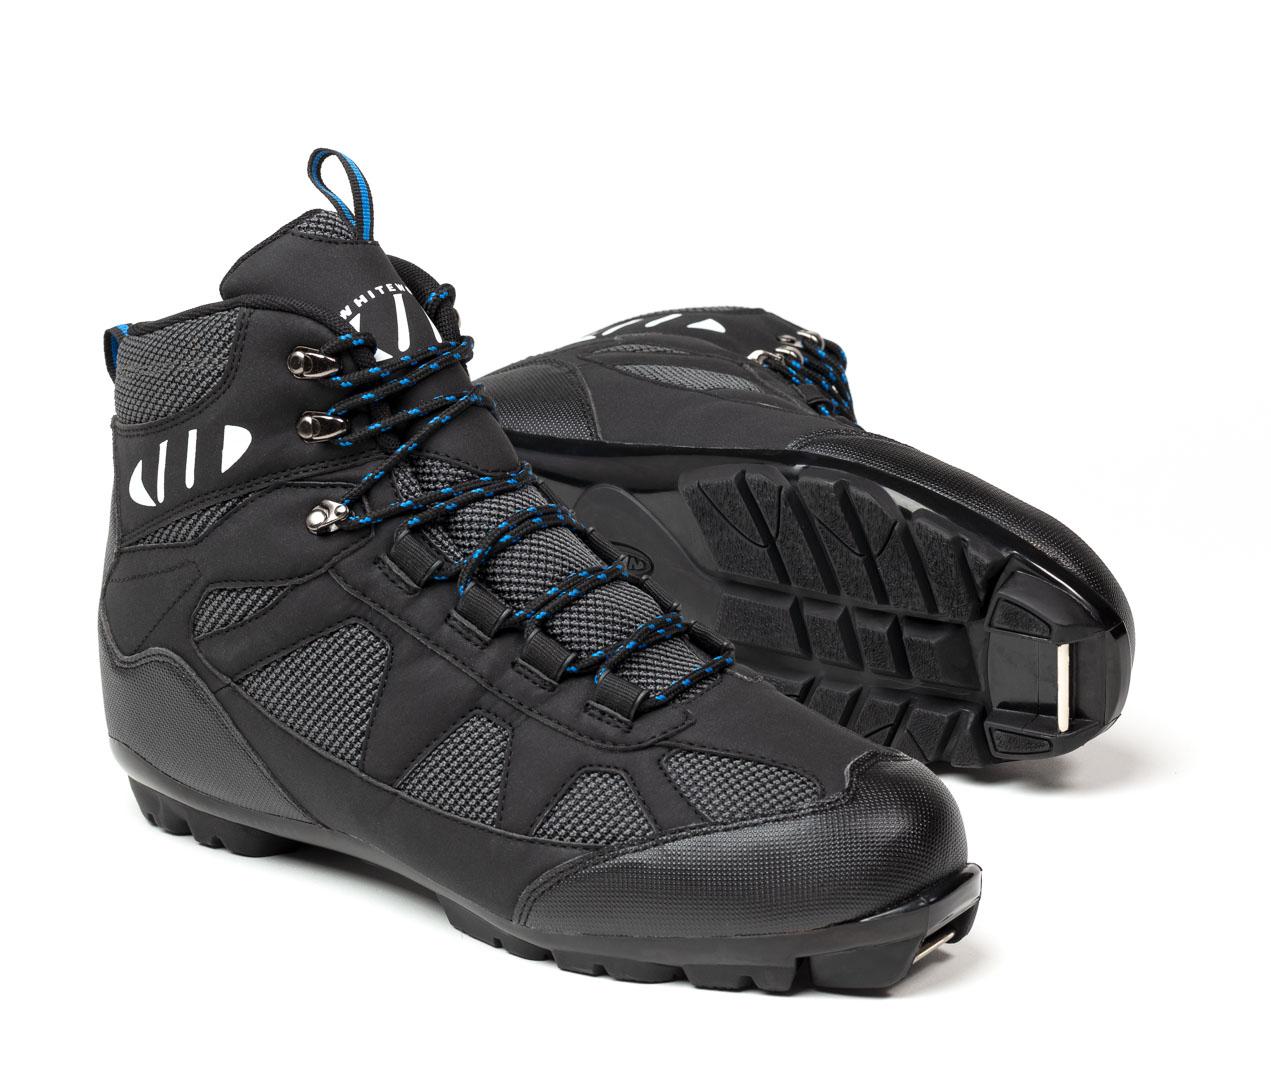 Whitewoods 302-NNN Ski Boots